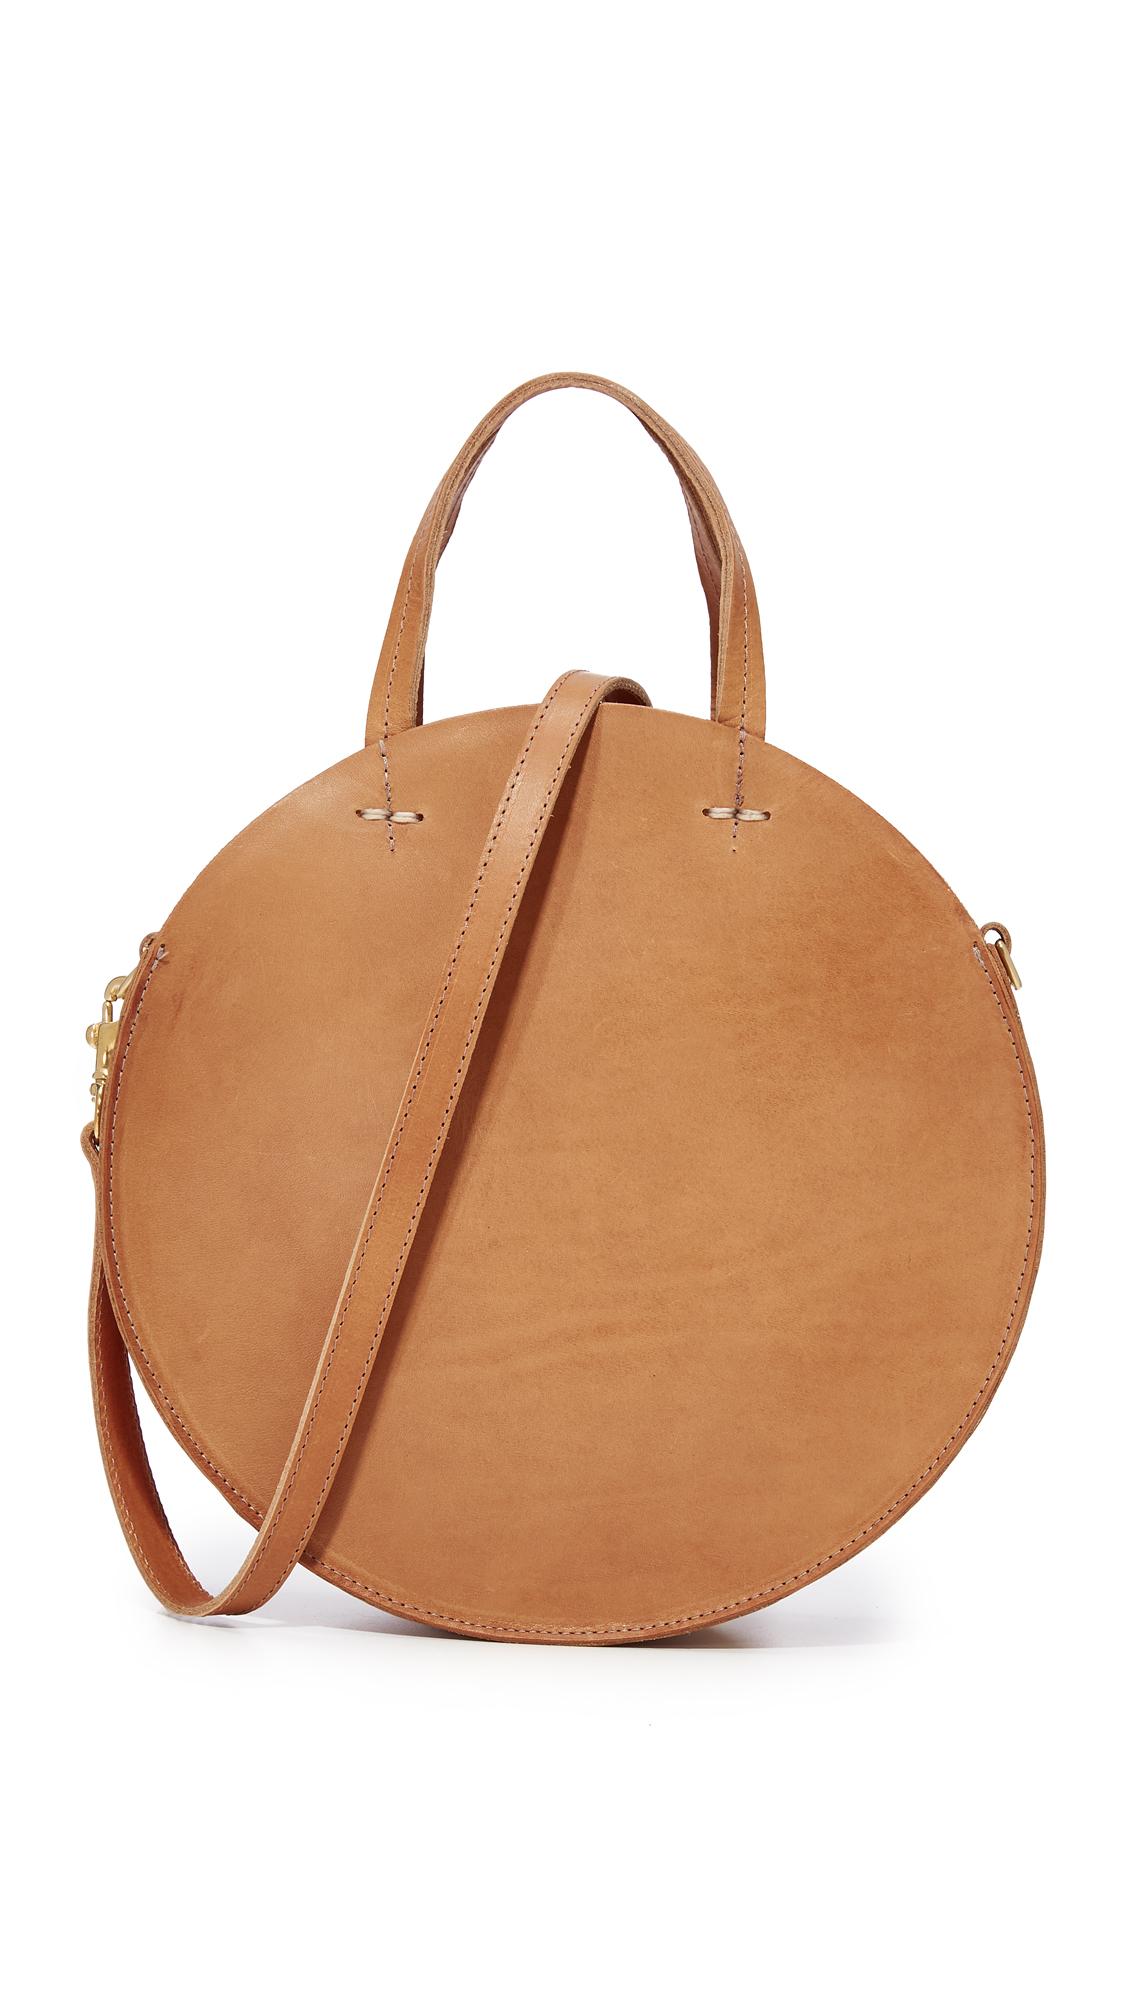 Clare V. Petite Alistair Circle Bag